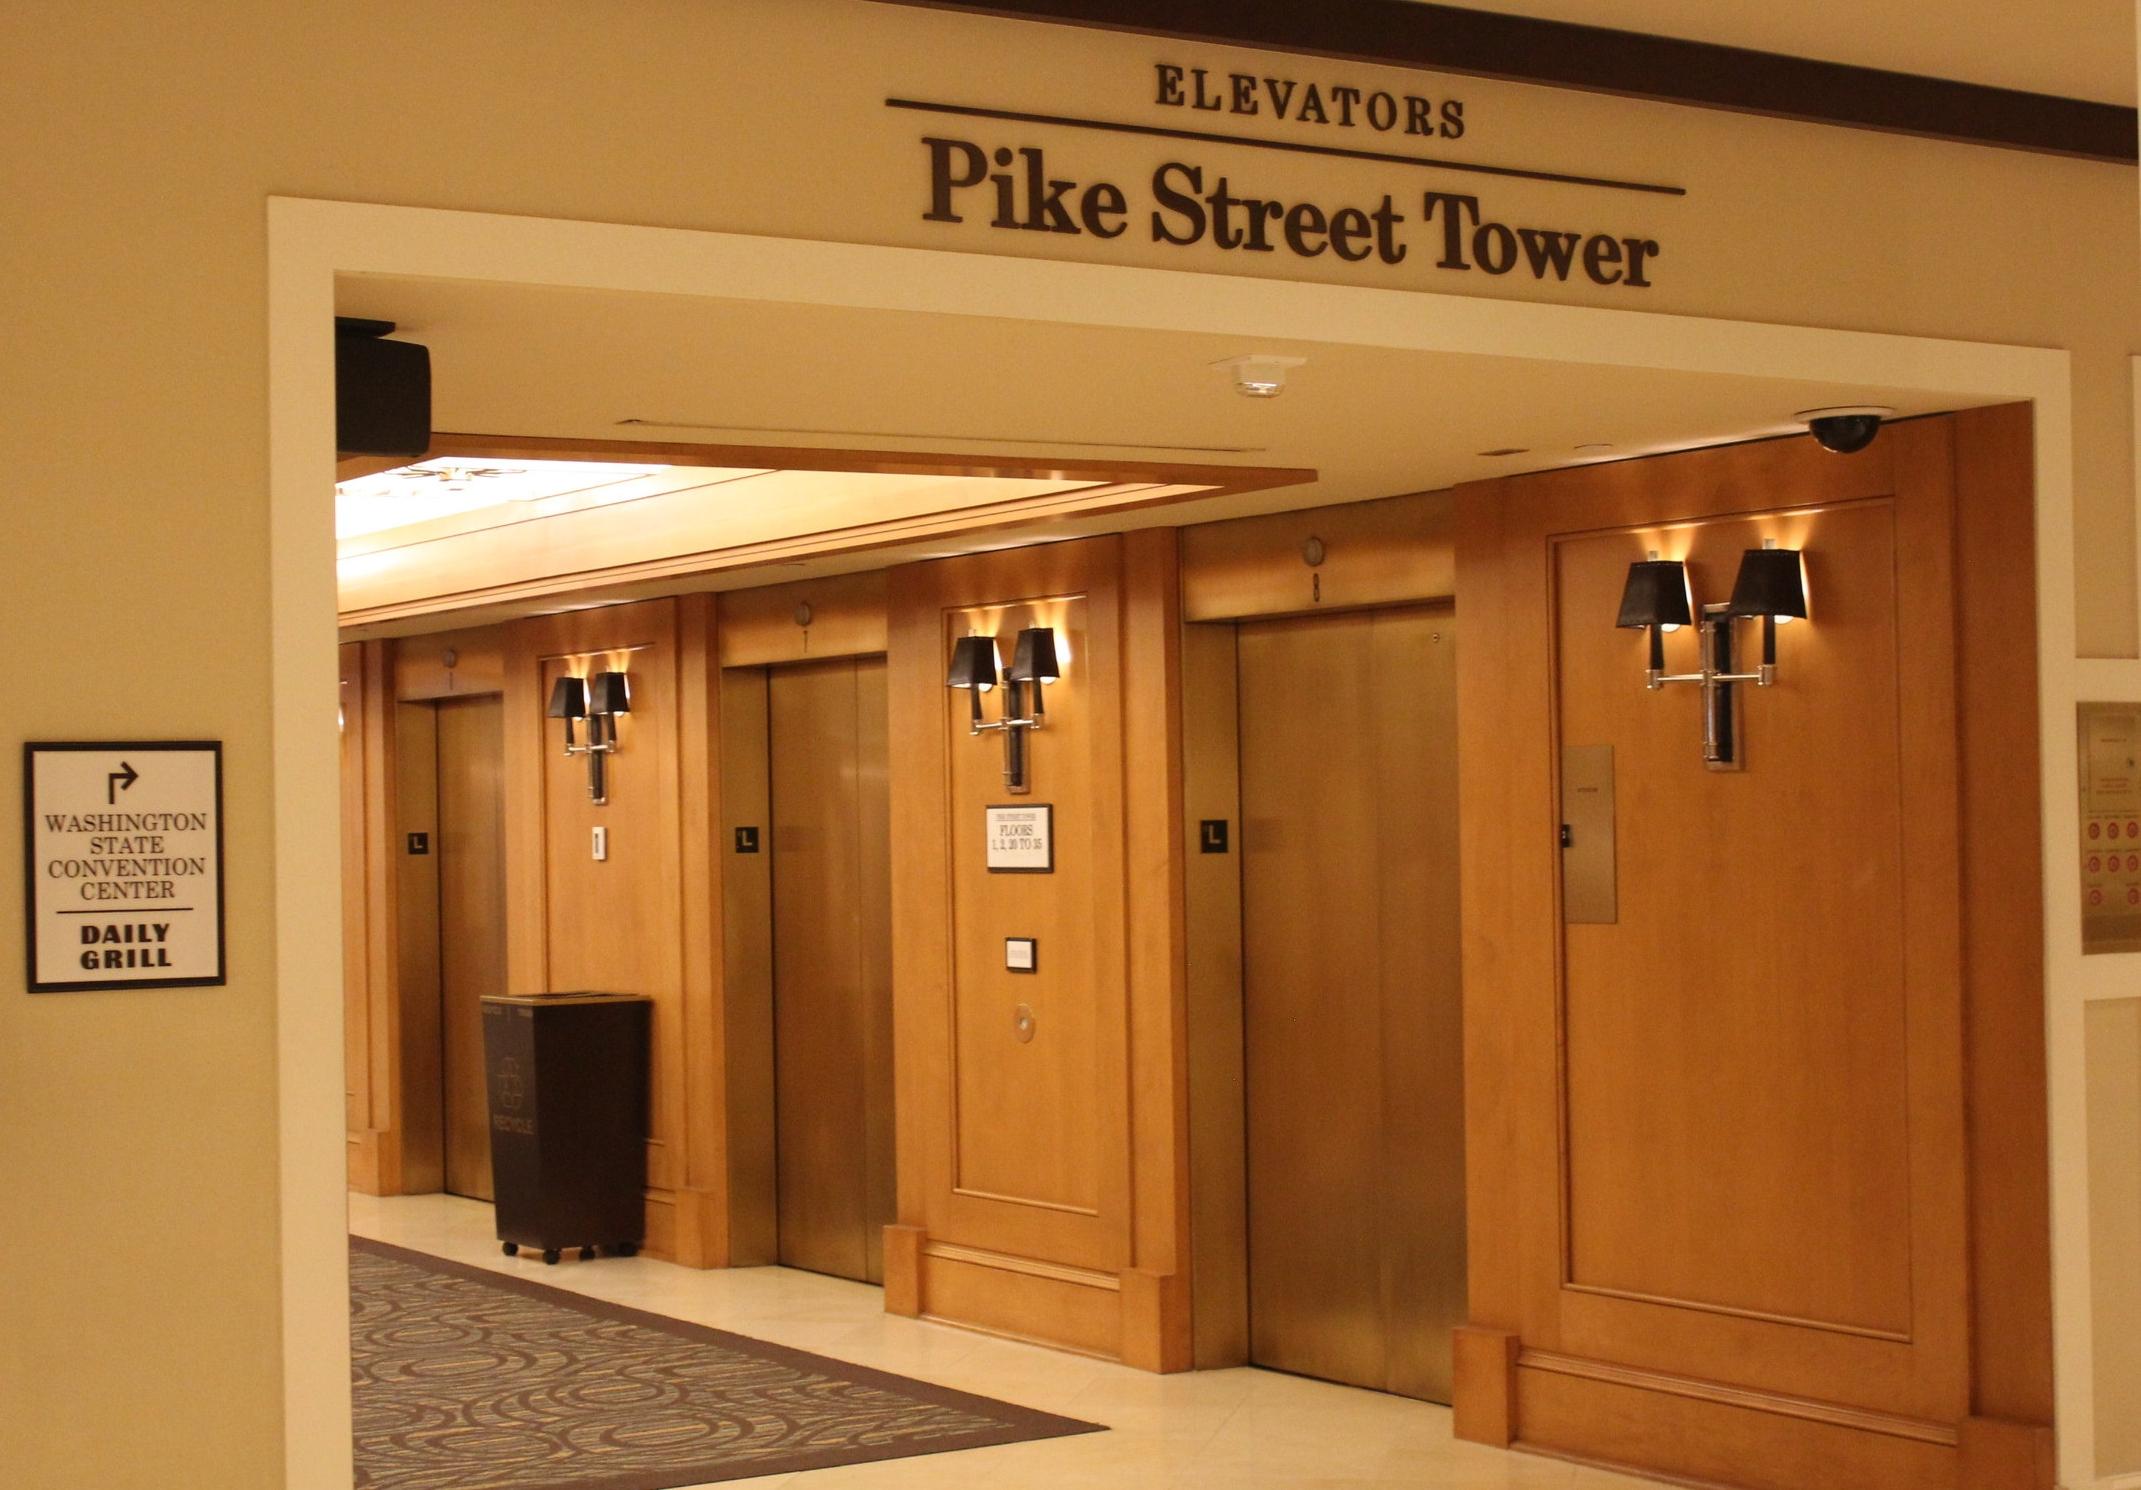 Sheraton Seattle – Pike Street Tower elevators